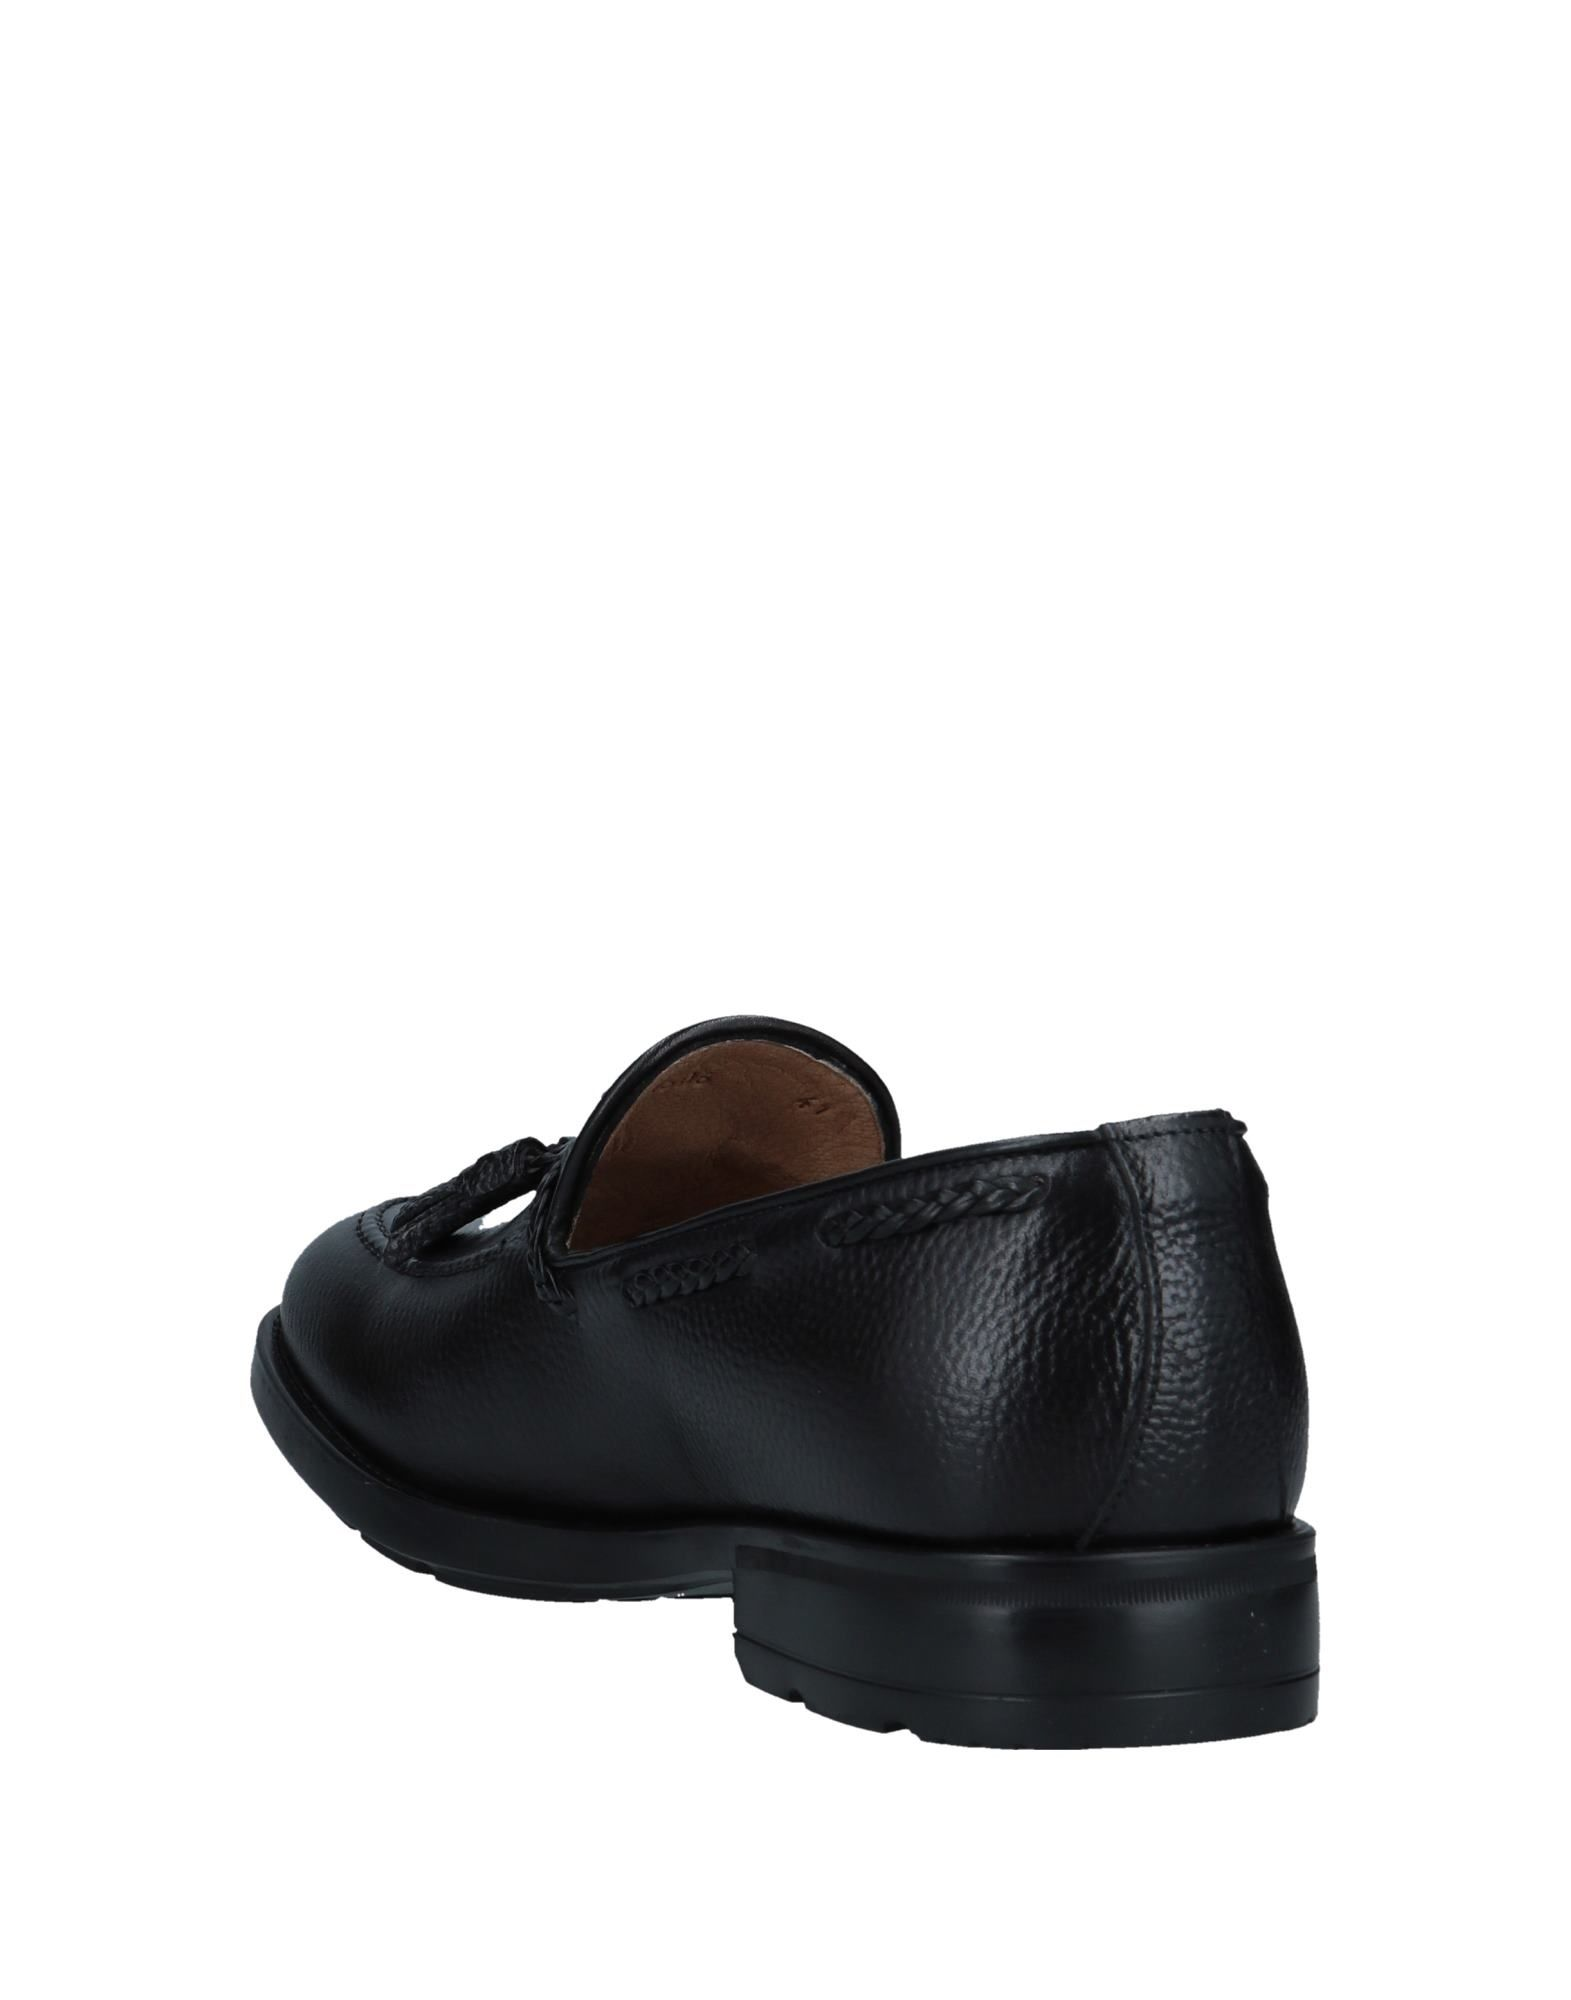 Baldinini Mokassins Qualität Herren  11554211DU Gute Qualität Mokassins beliebte Schuhe b3c3c0